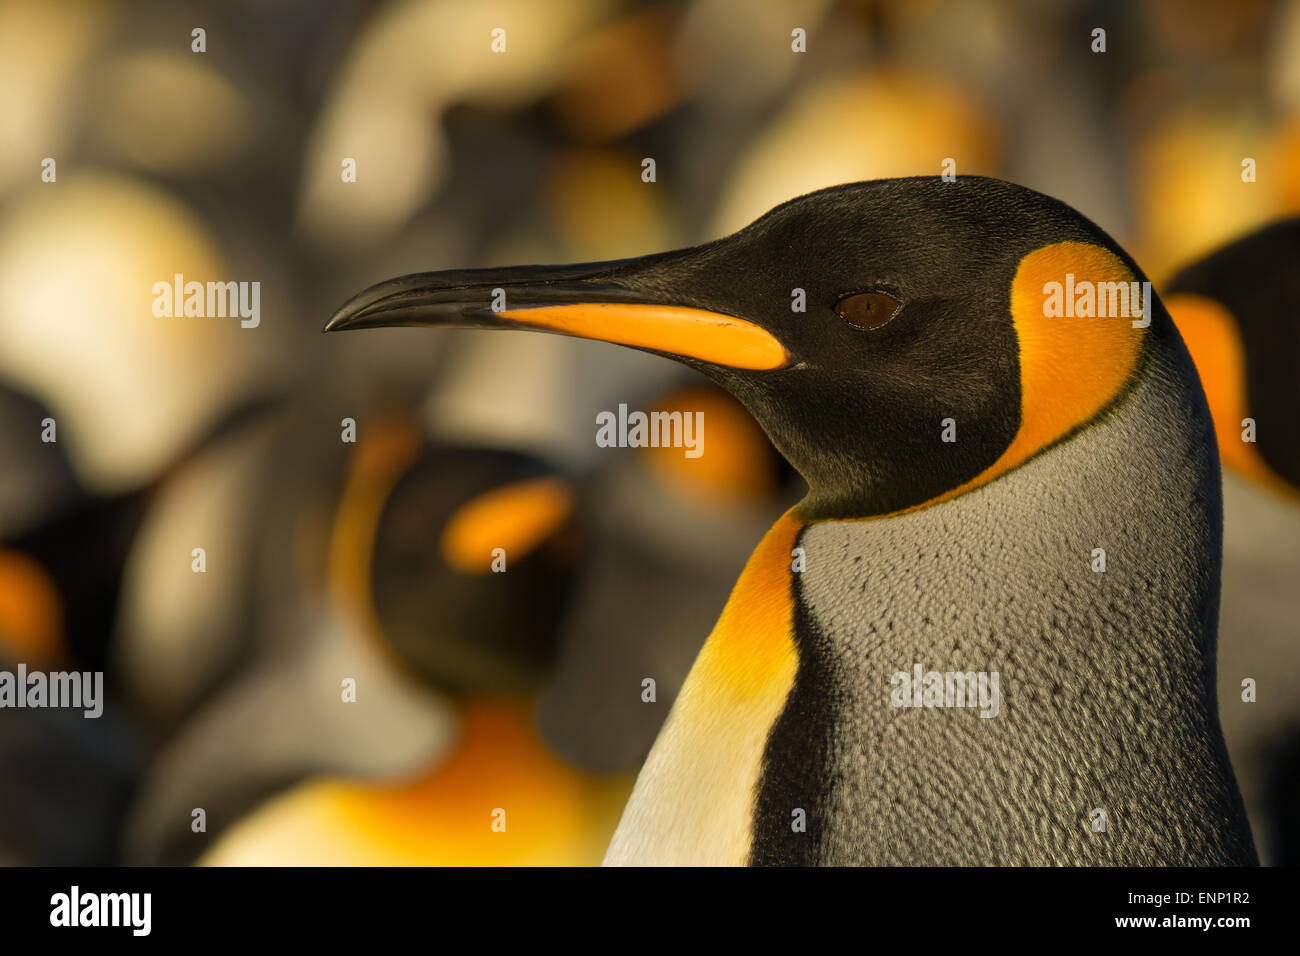 Nahaufnahme der Erwachsenen König Pinguin, Falkland-Inseln Stockbild